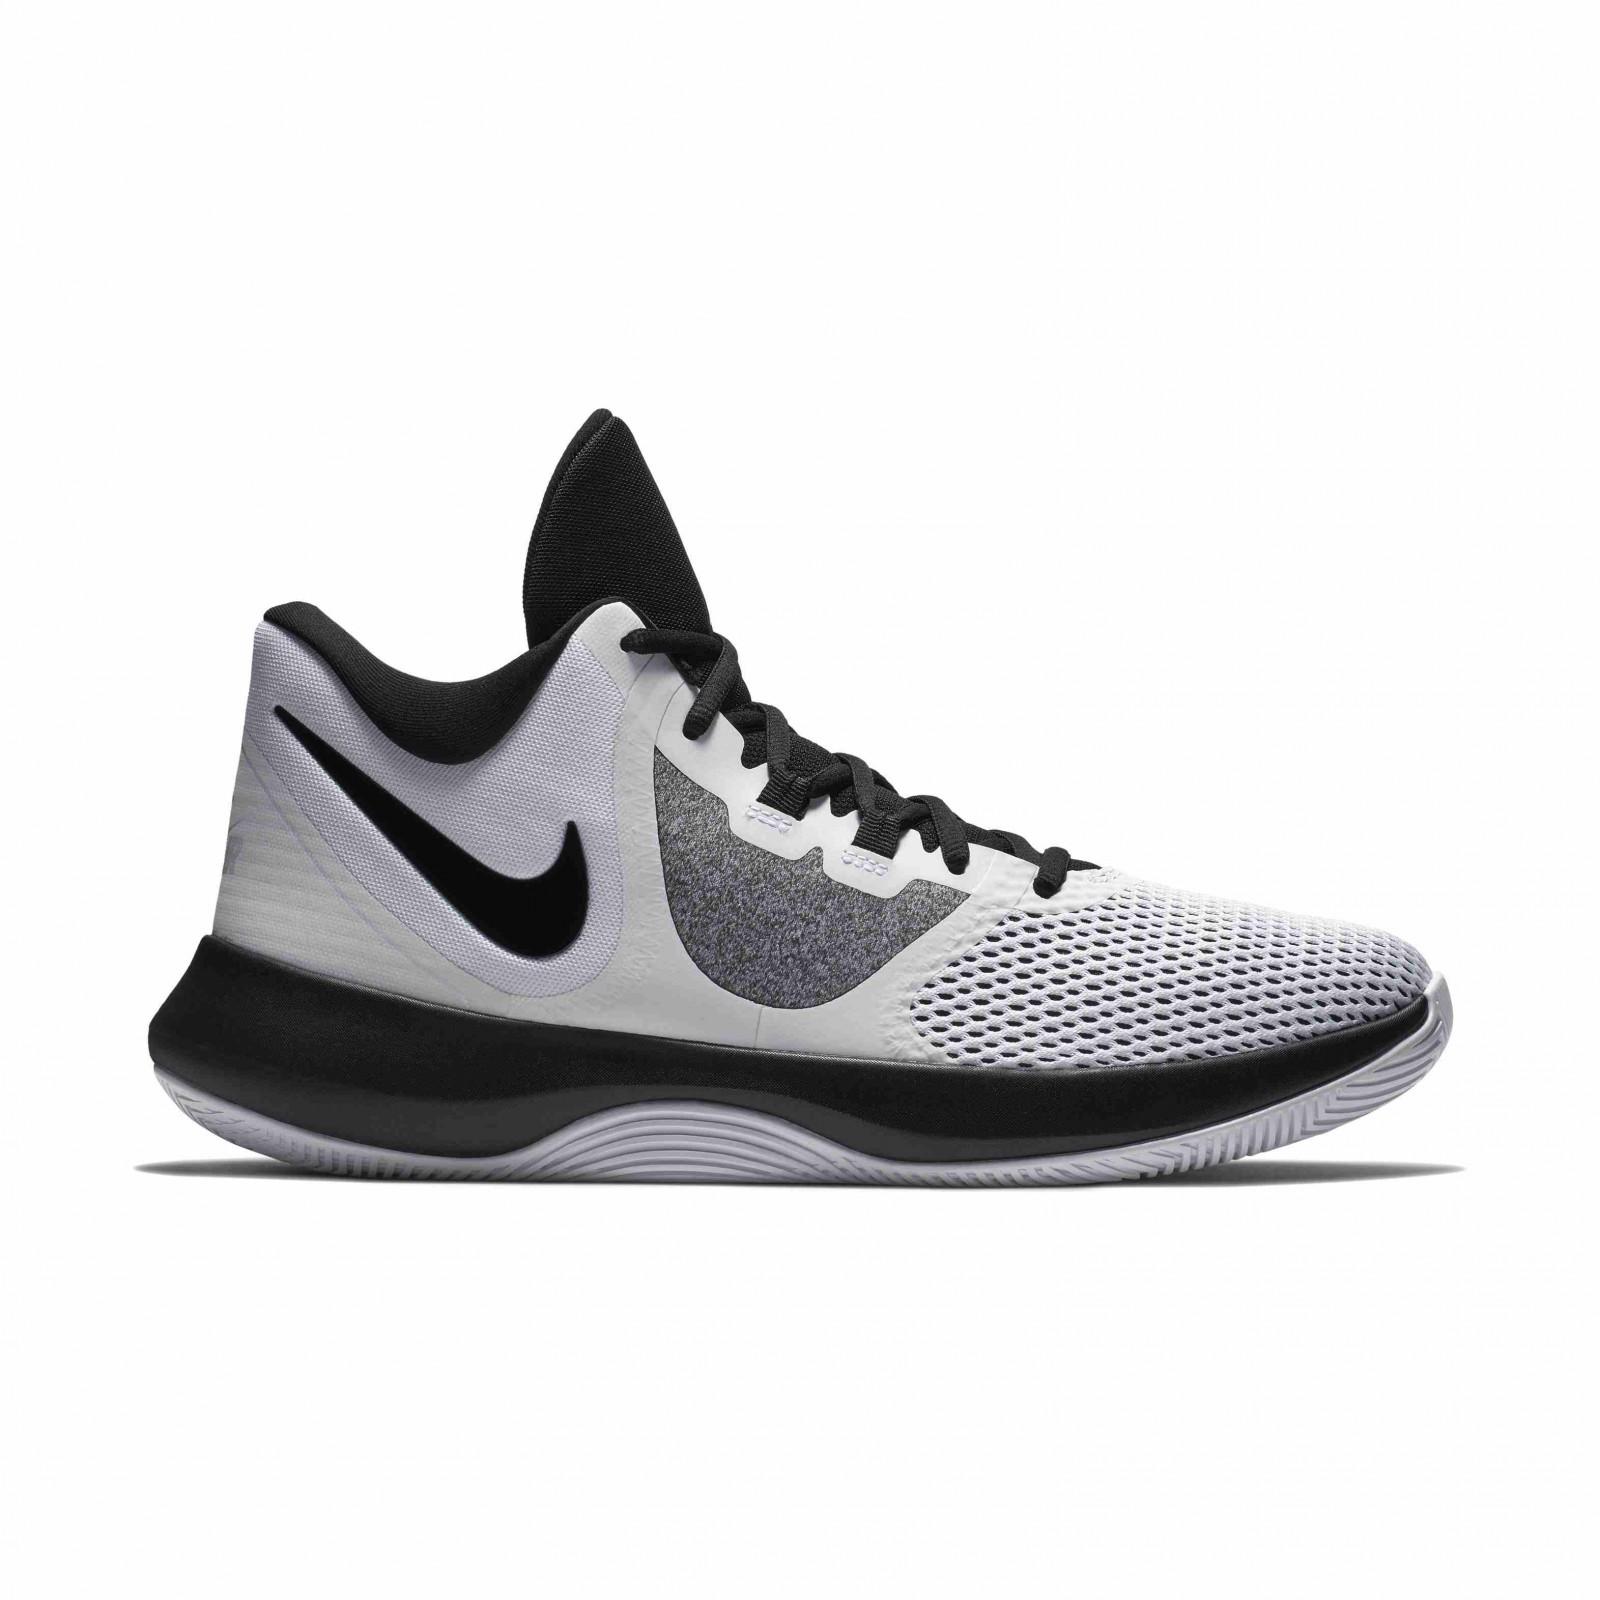 fb6522e6f217b Pánské Basketbalové boty Nike AIR PRECISION II | D-Sport